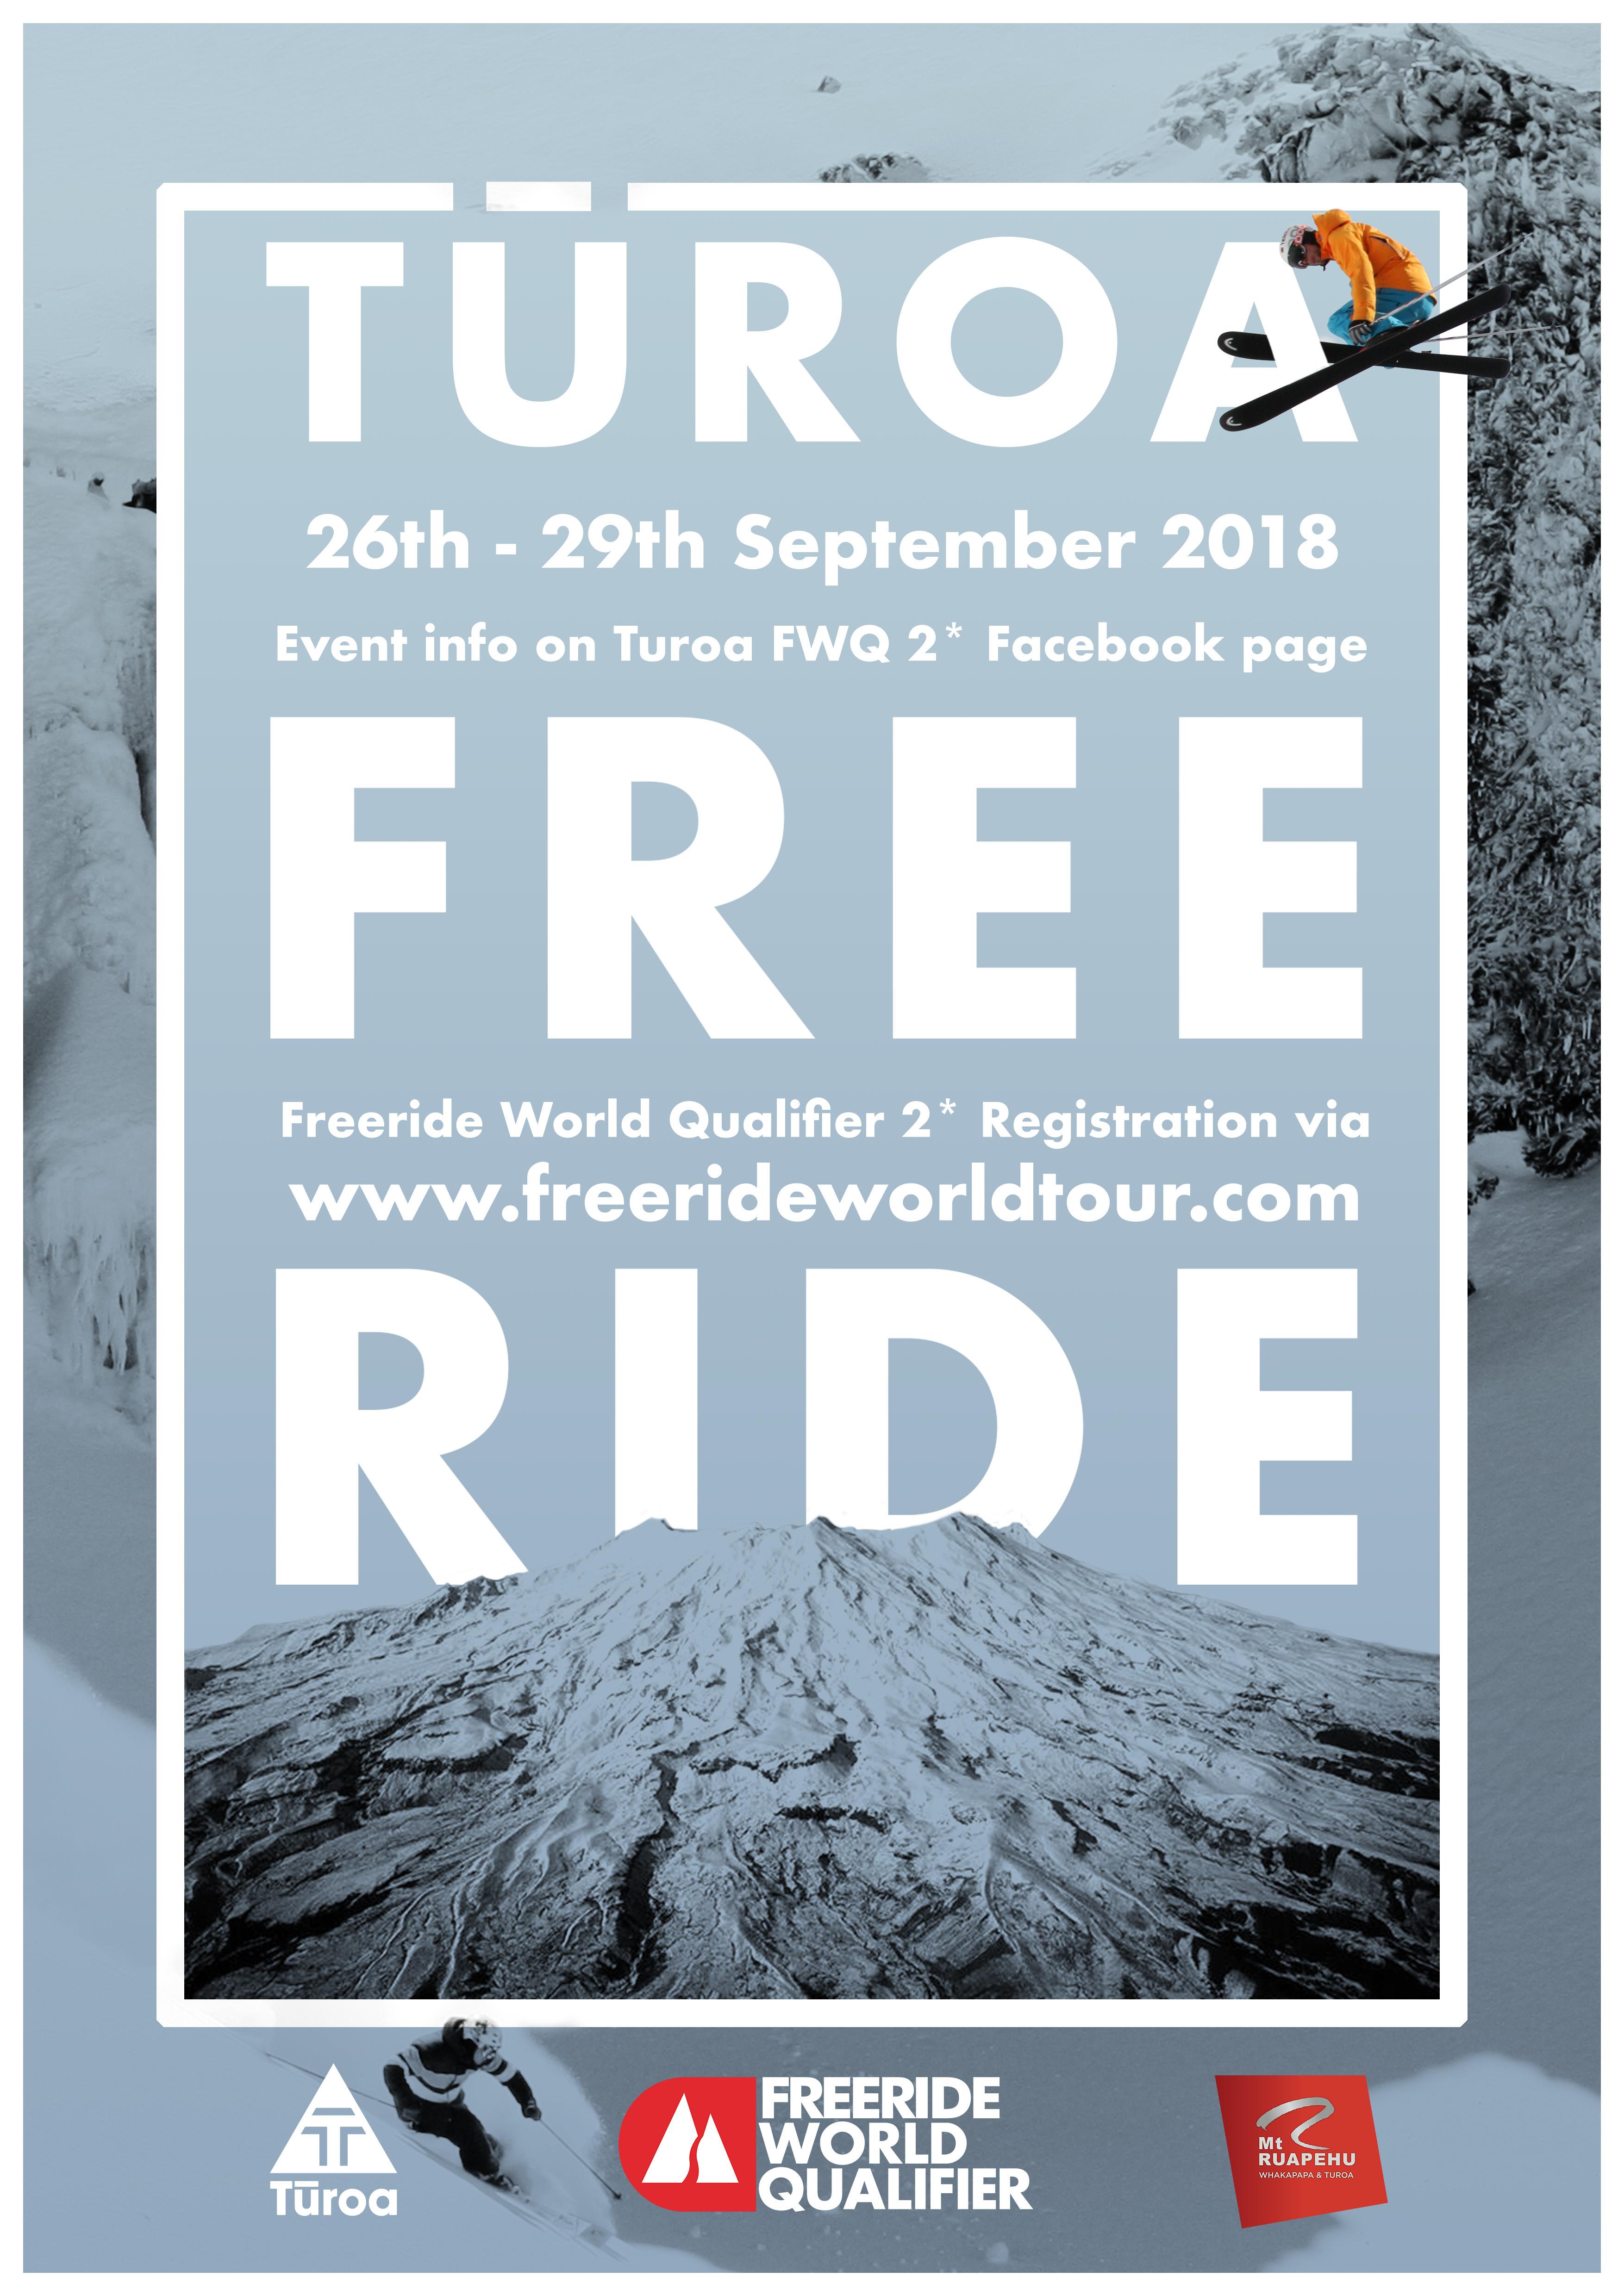 turoa free ride ski poster event